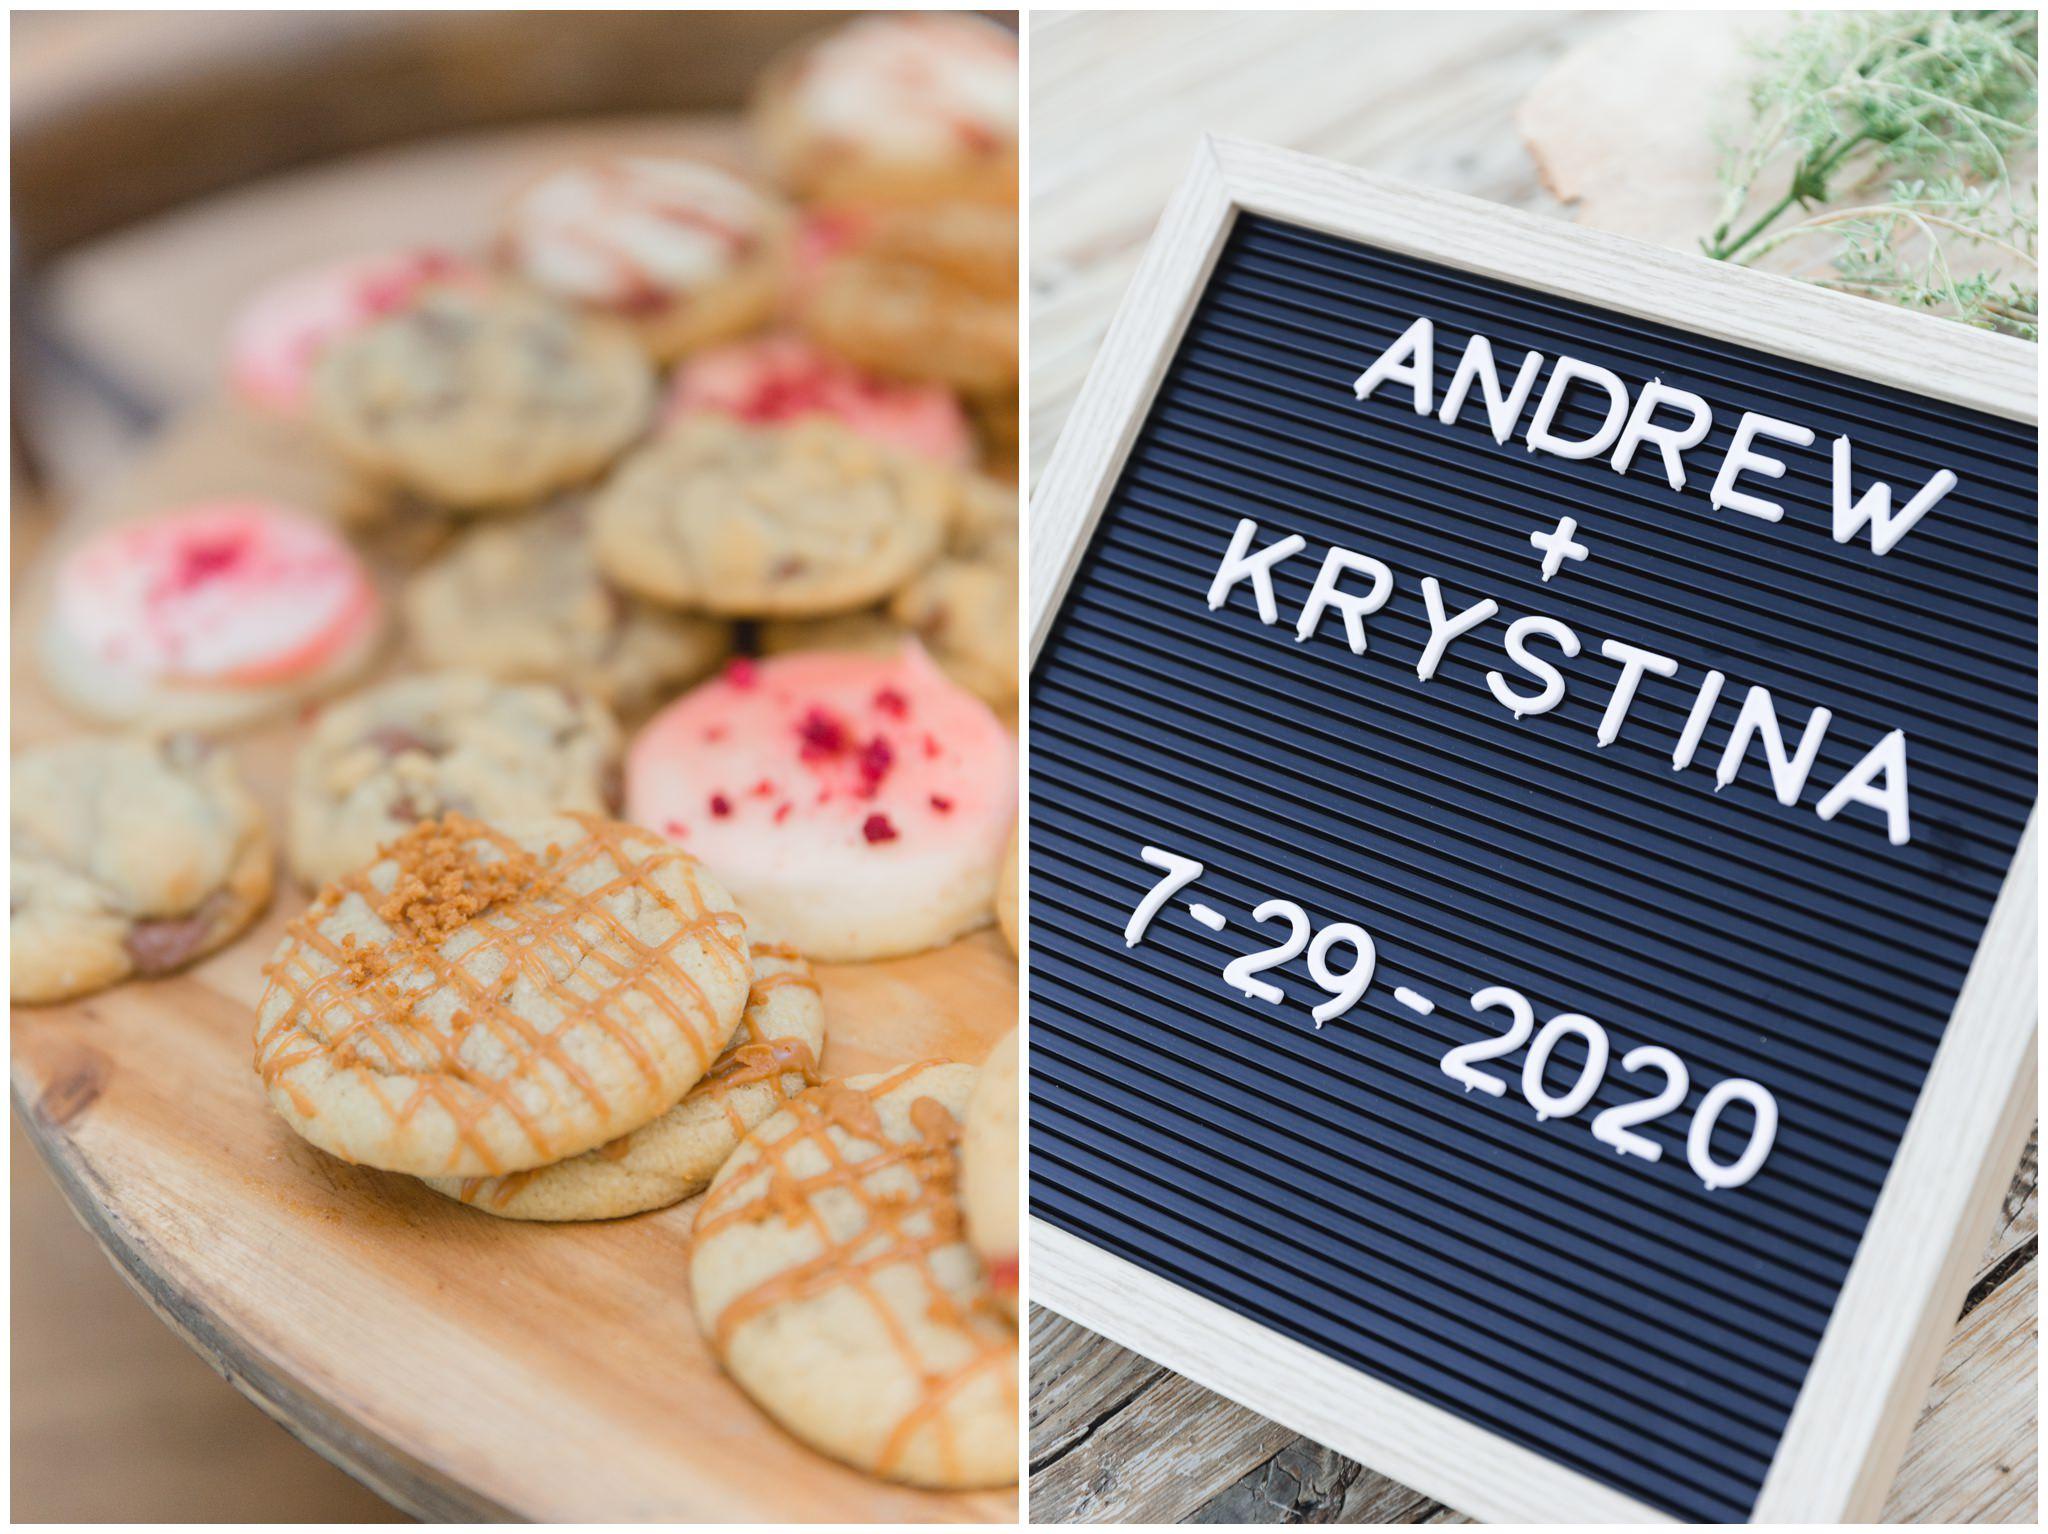 Wedding details of cookie and wedding sign at summer wedding in Utah